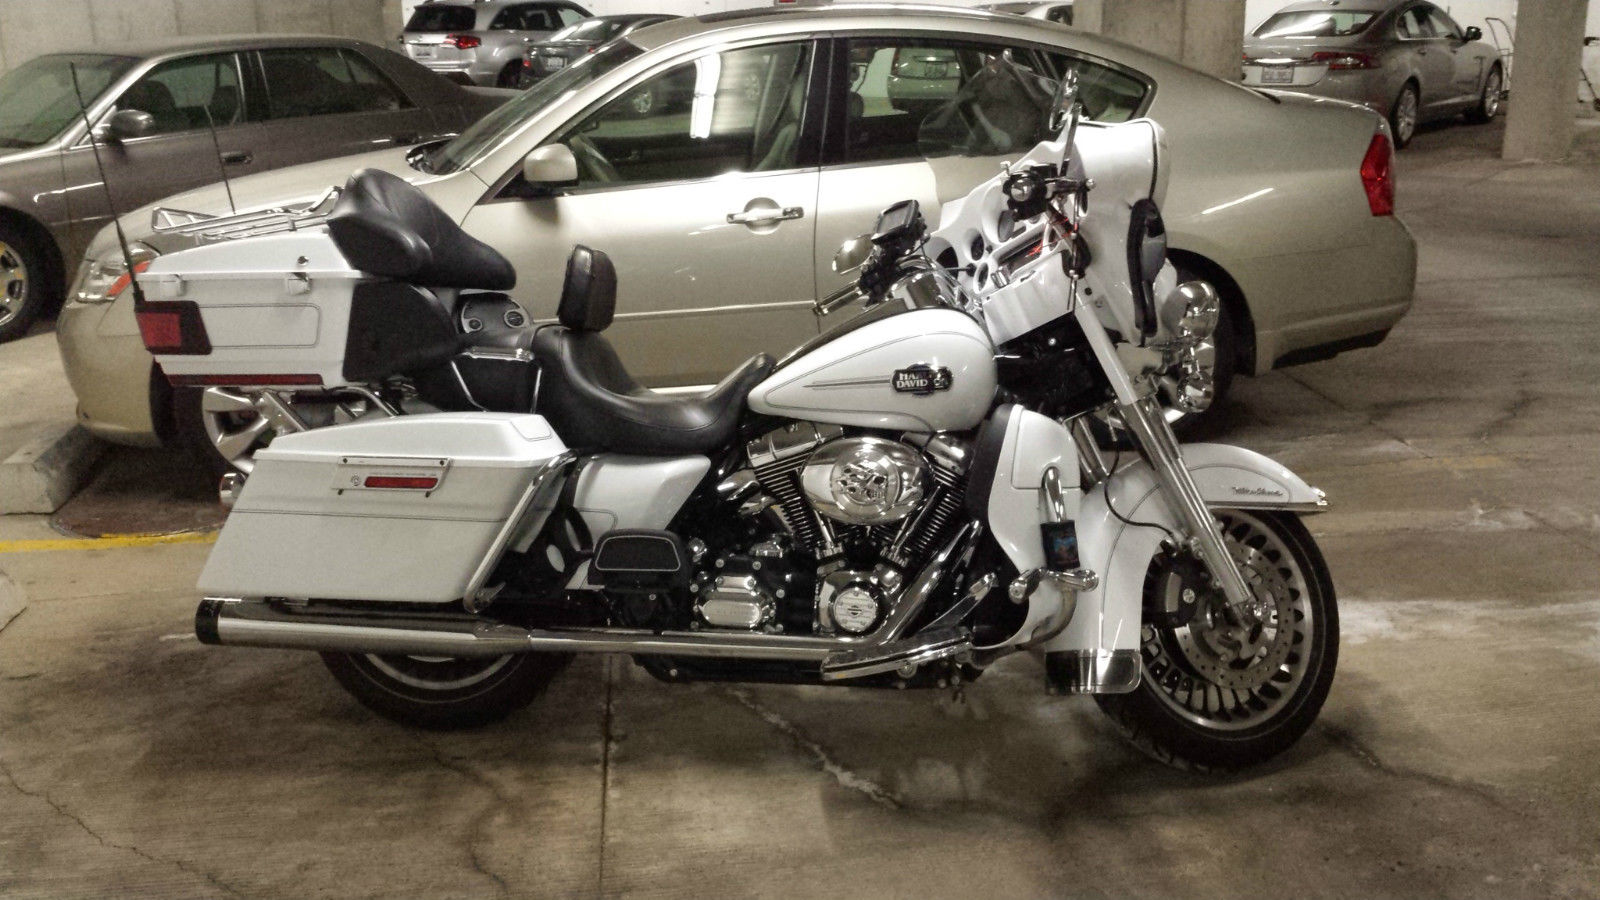 White Harley Davidson: Harley Davidson 2012 FLHTCU Pearl White Metallic